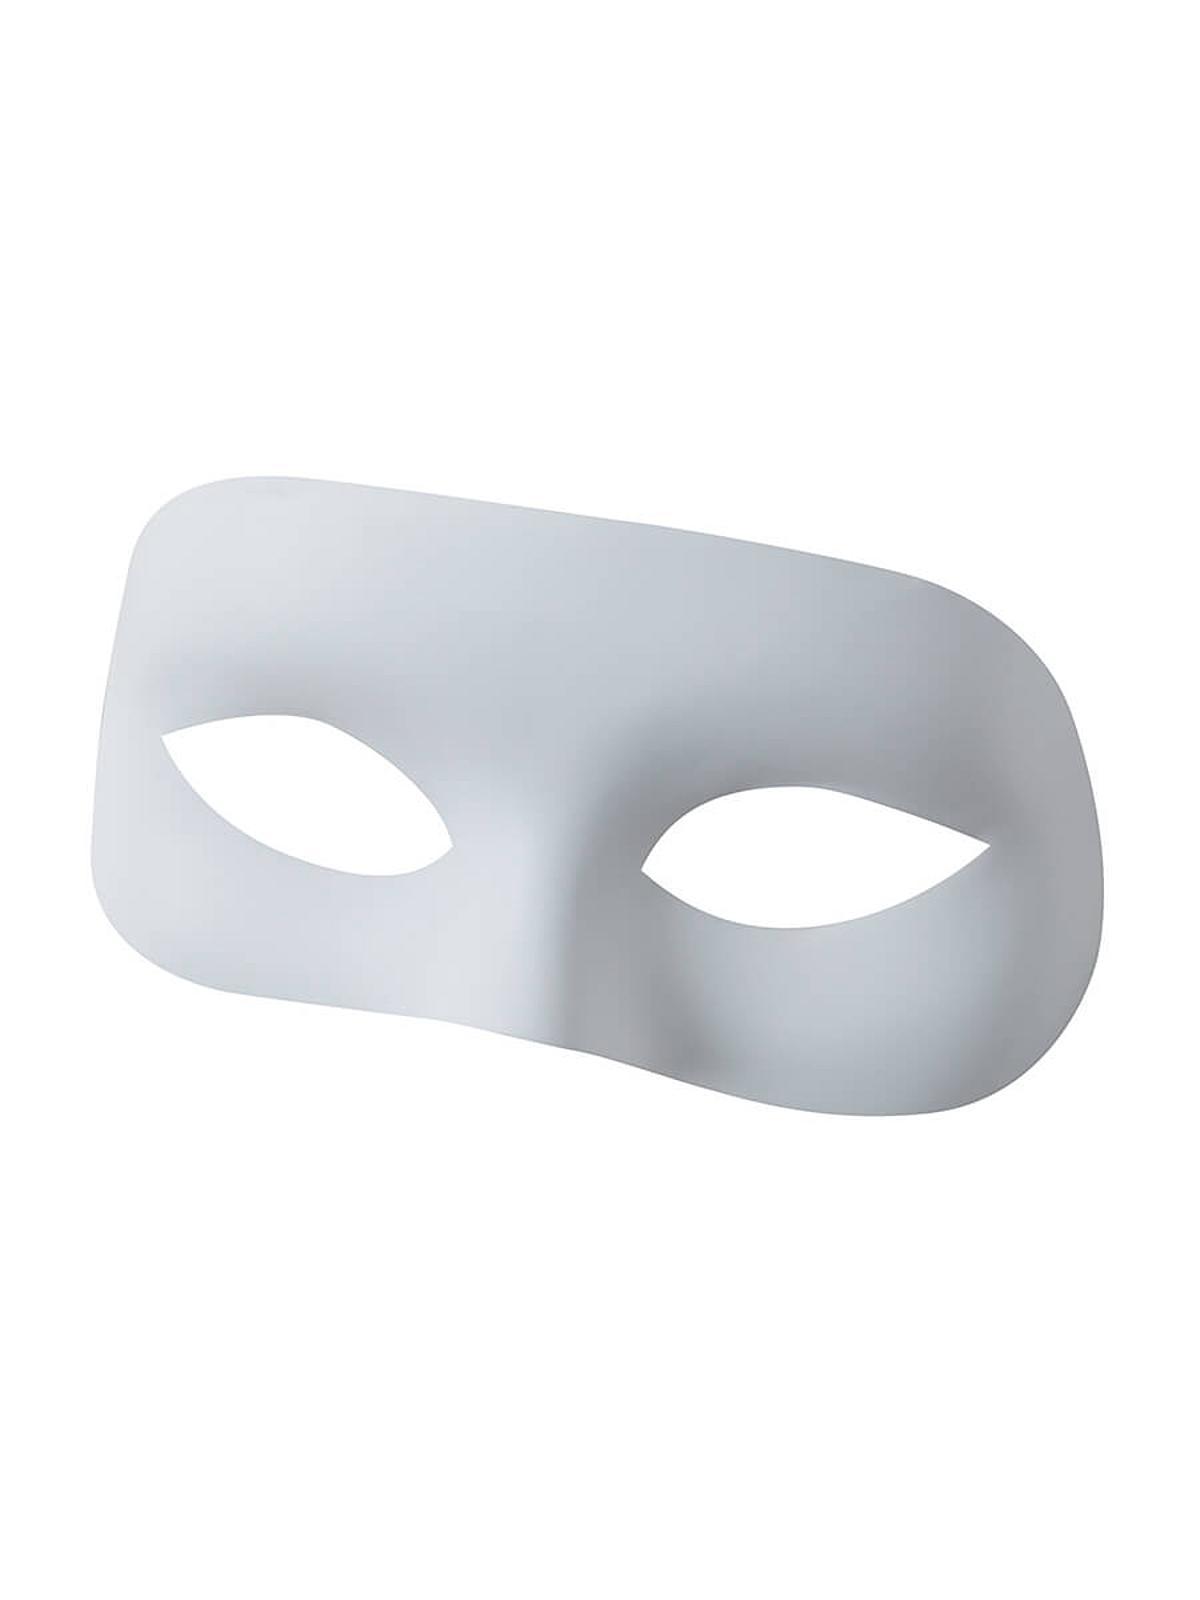 Creativity Street Mask